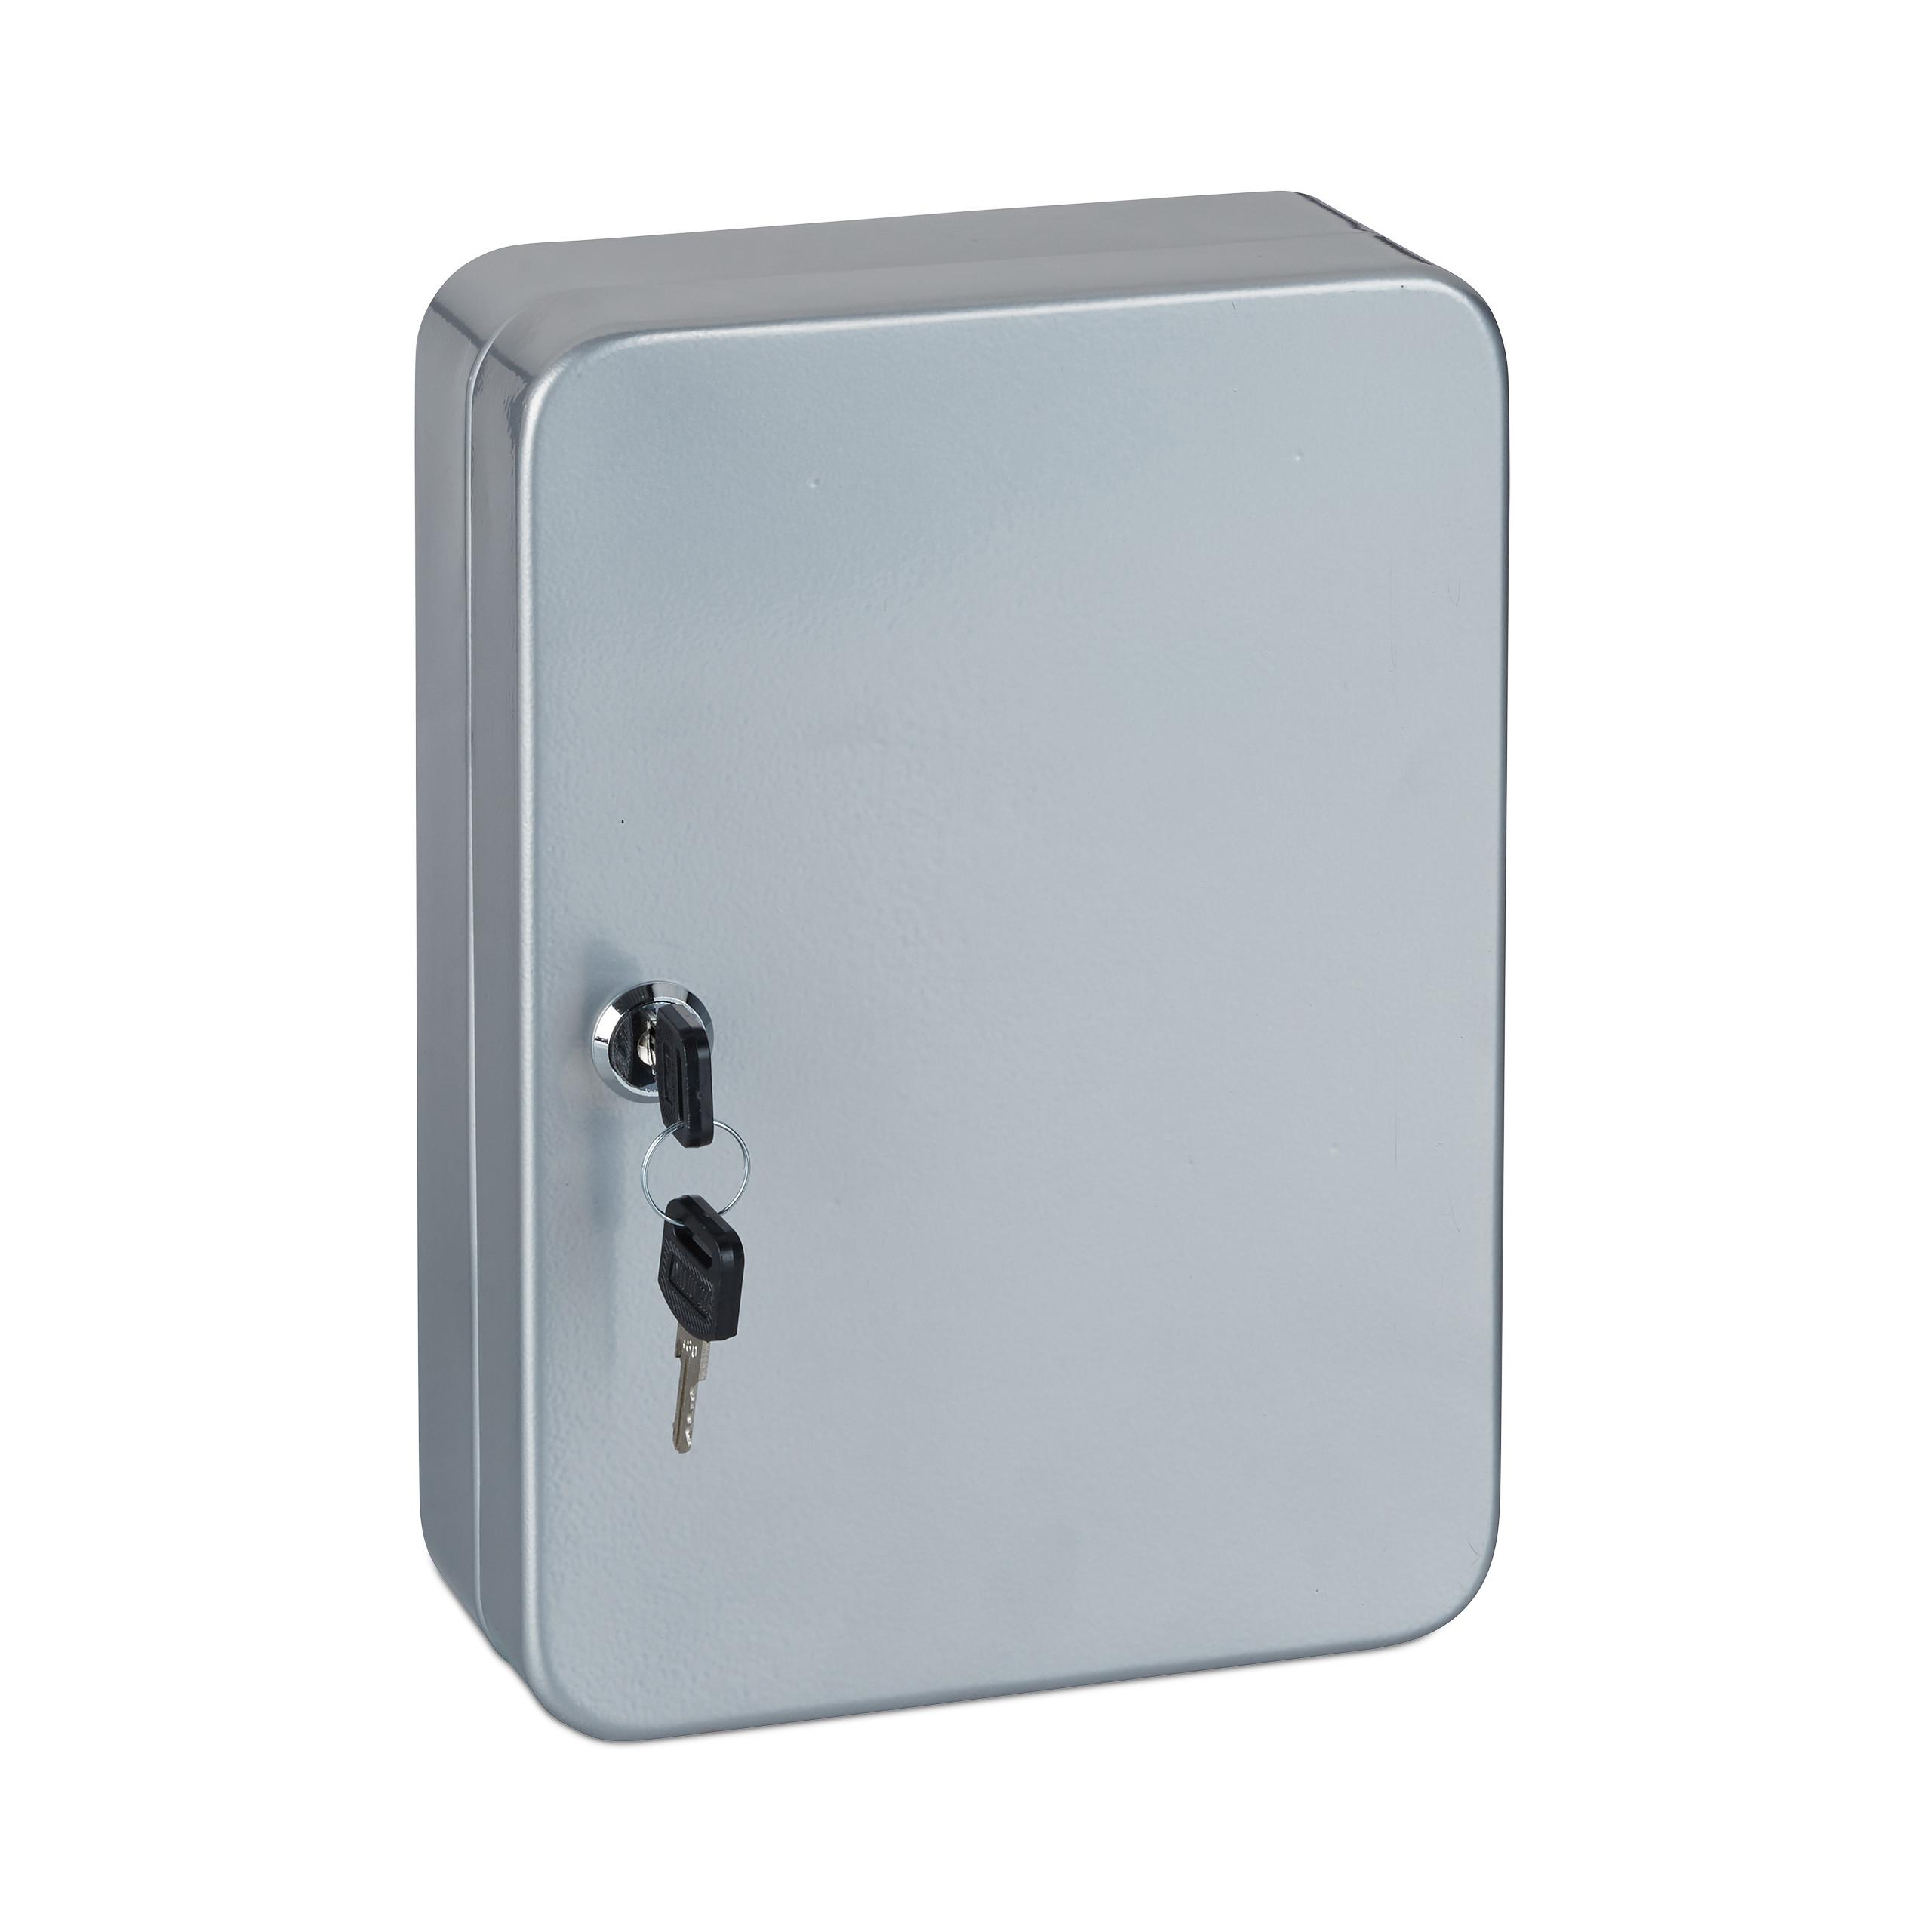 Schlüsselkasten Metall Schlüsselbox Schlüsselsafe abschließbar Key Box 48 Haken